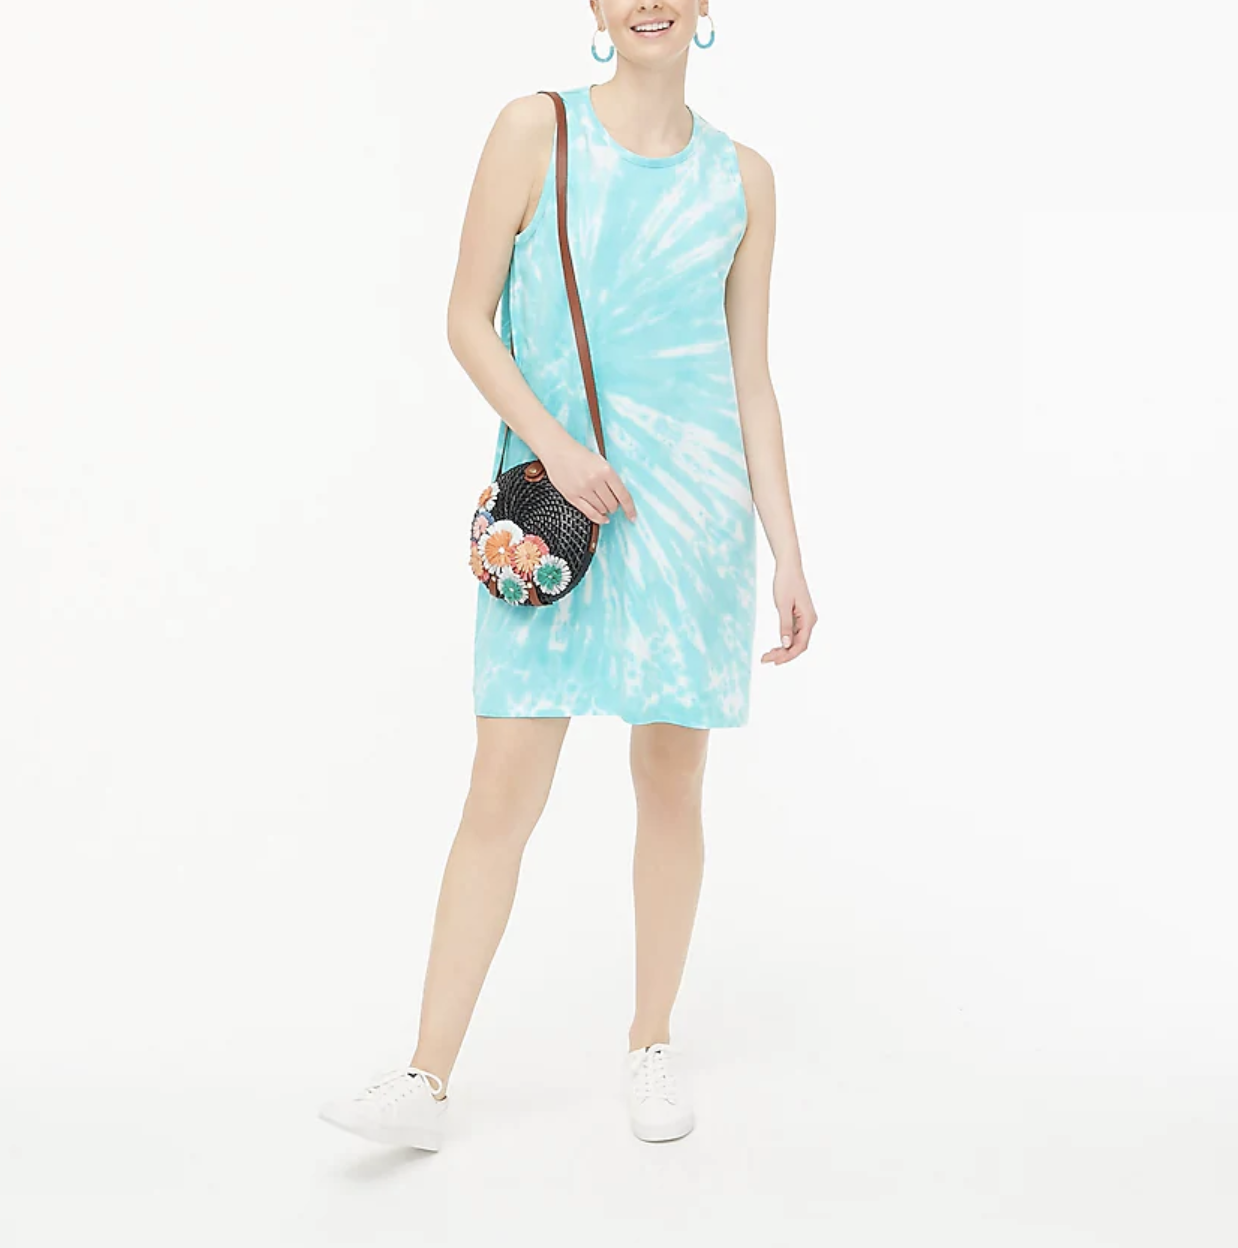 A model wears the blue tie-dyed cotton dress